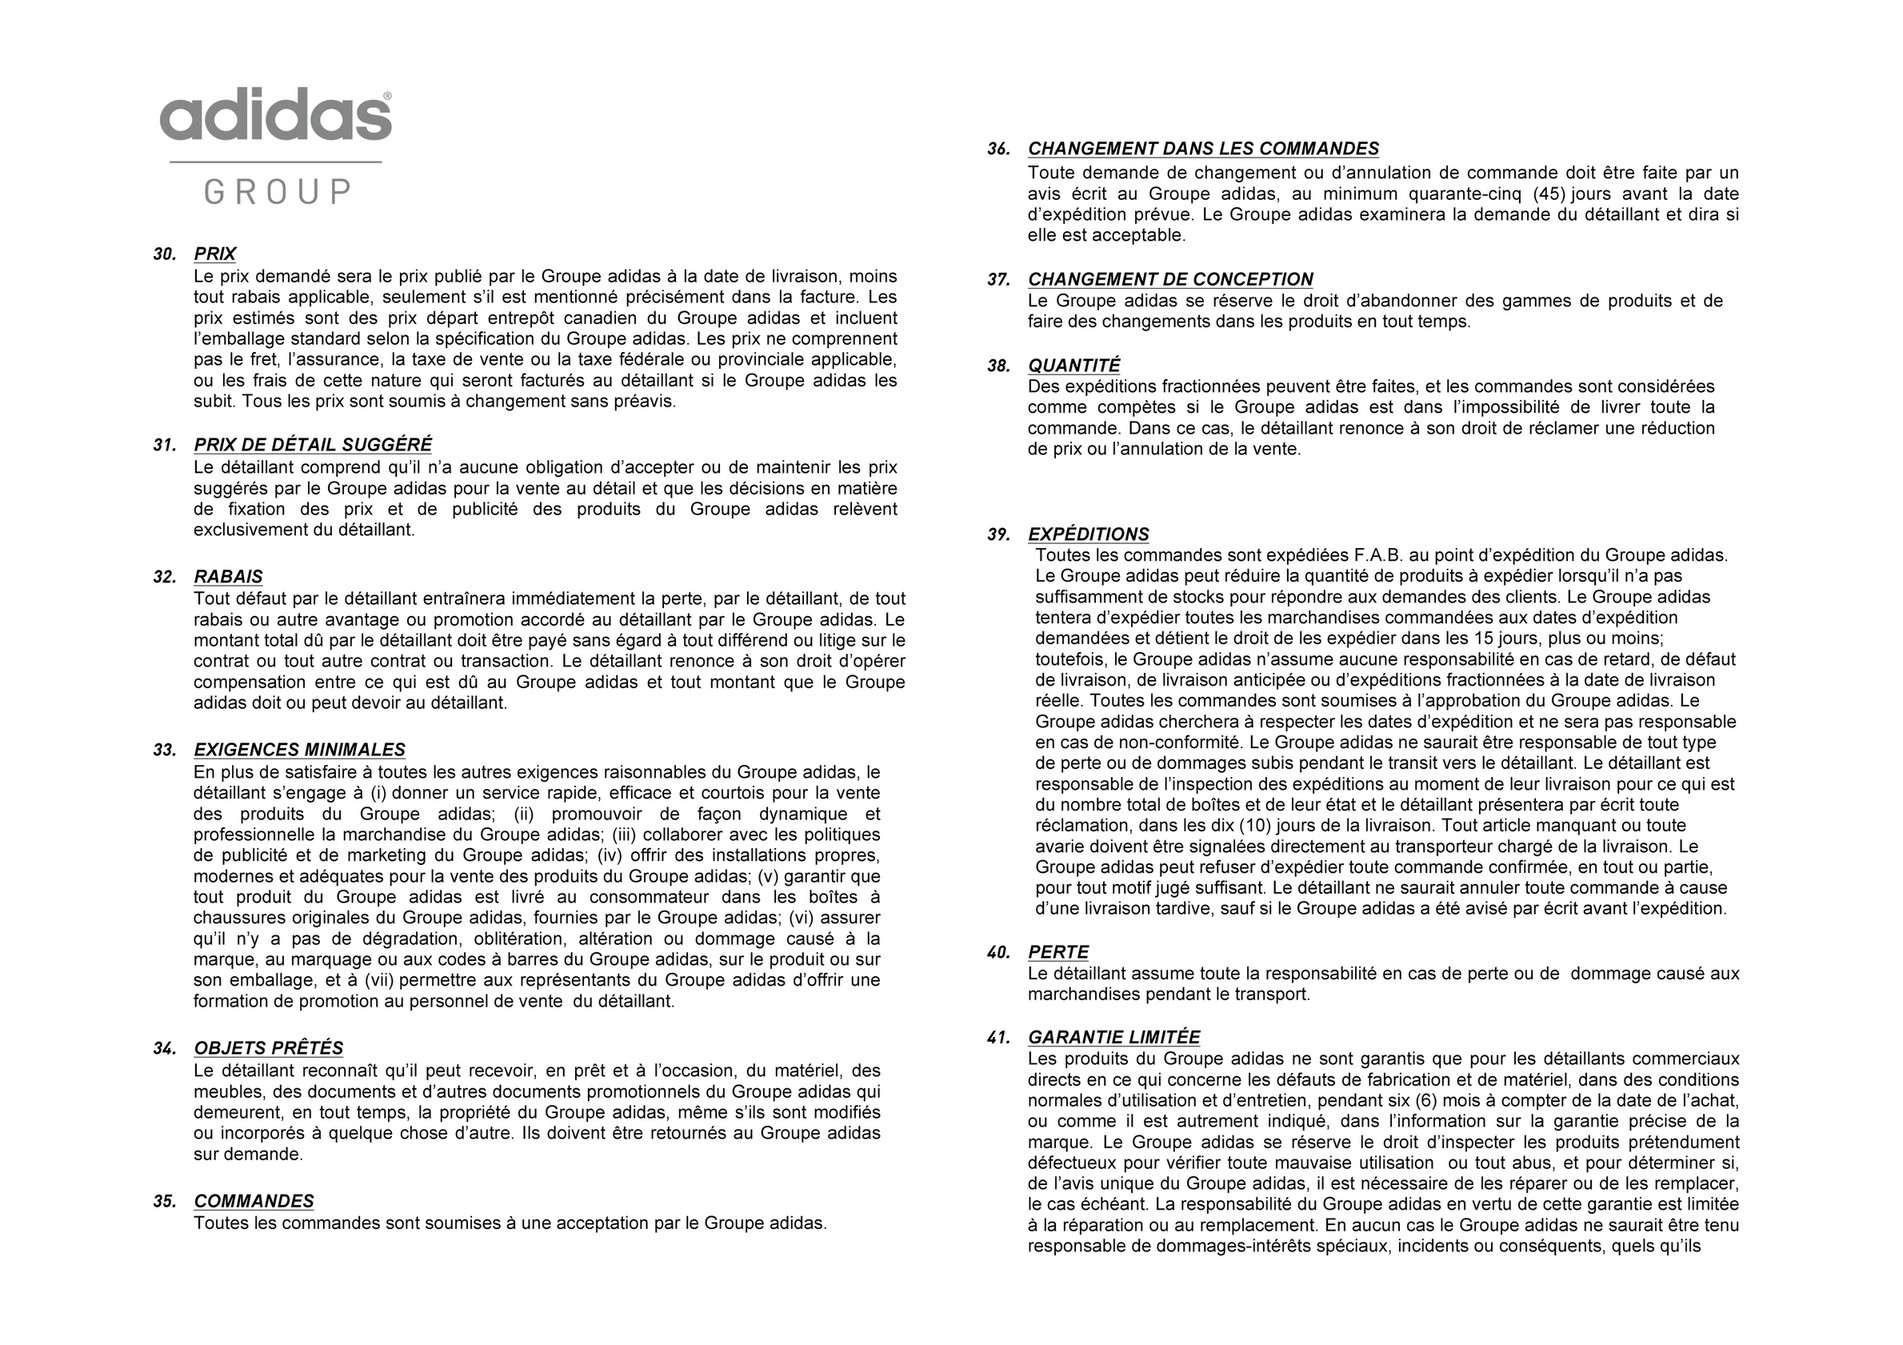 pmp logo on resume resume app for macbook pro